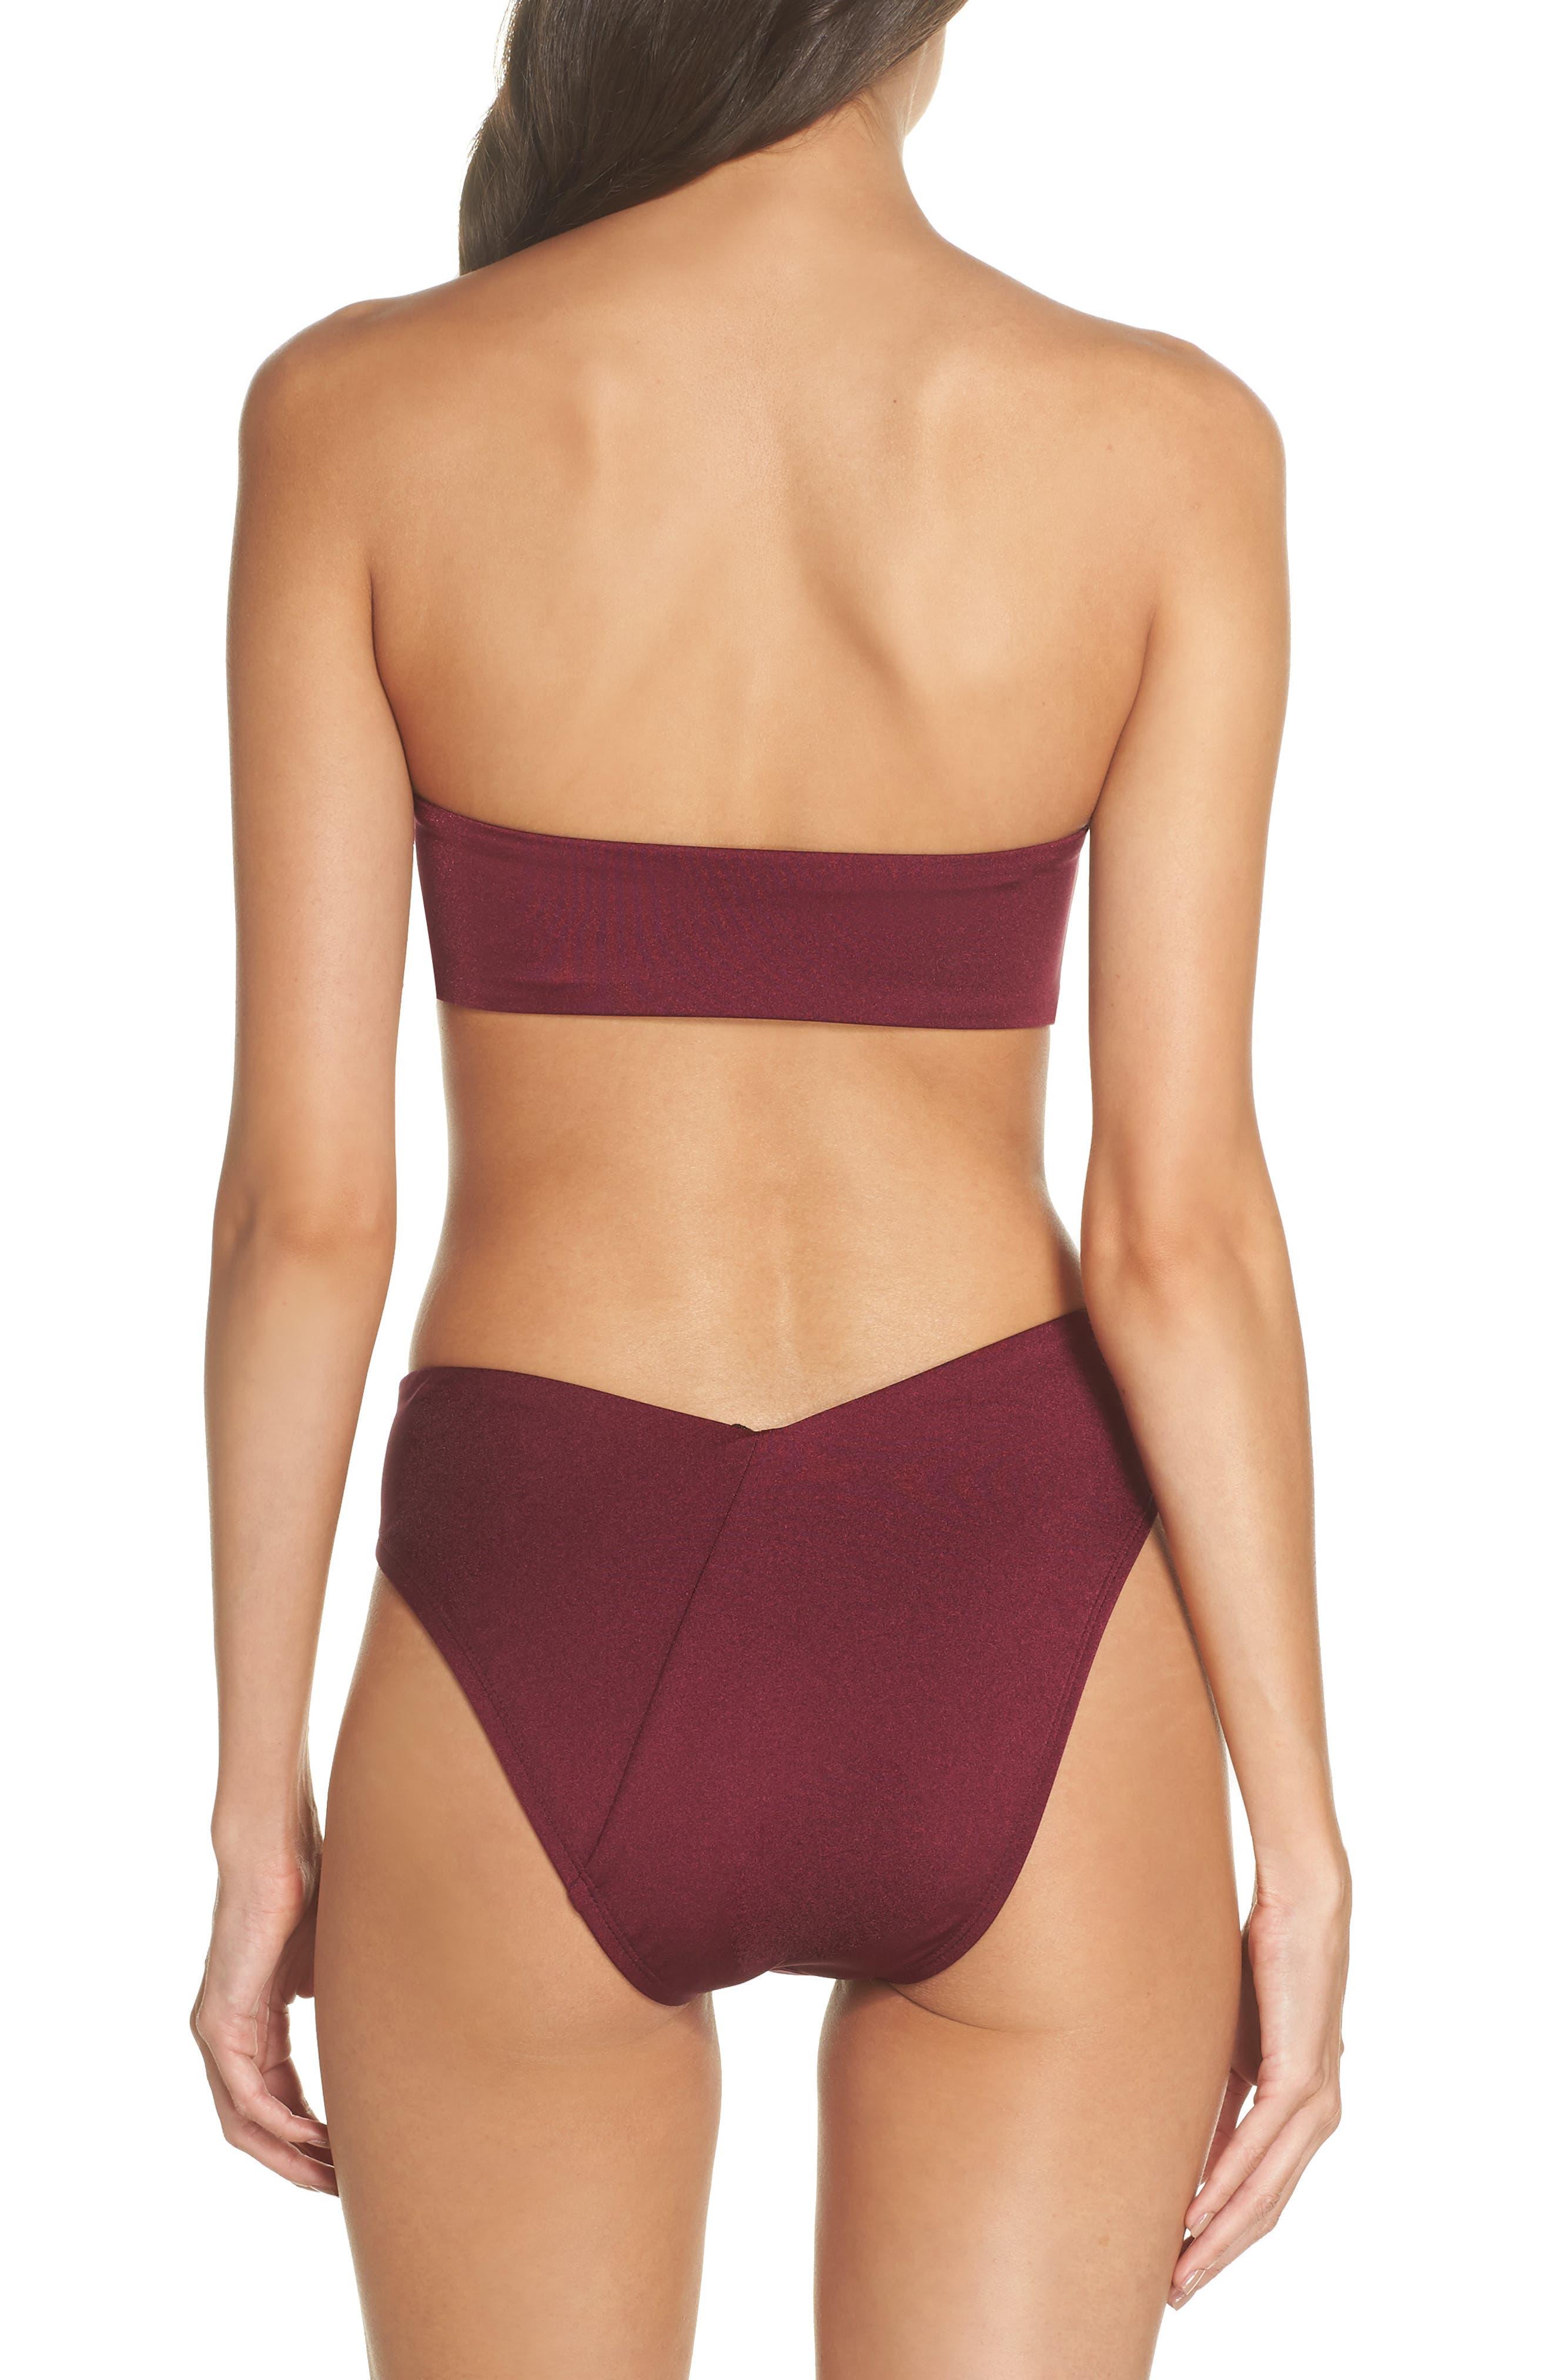 Riviera High Waist Bikini Bottoms,                             Alternate thumbnail 8, color,                             BURGUNDY FIELD